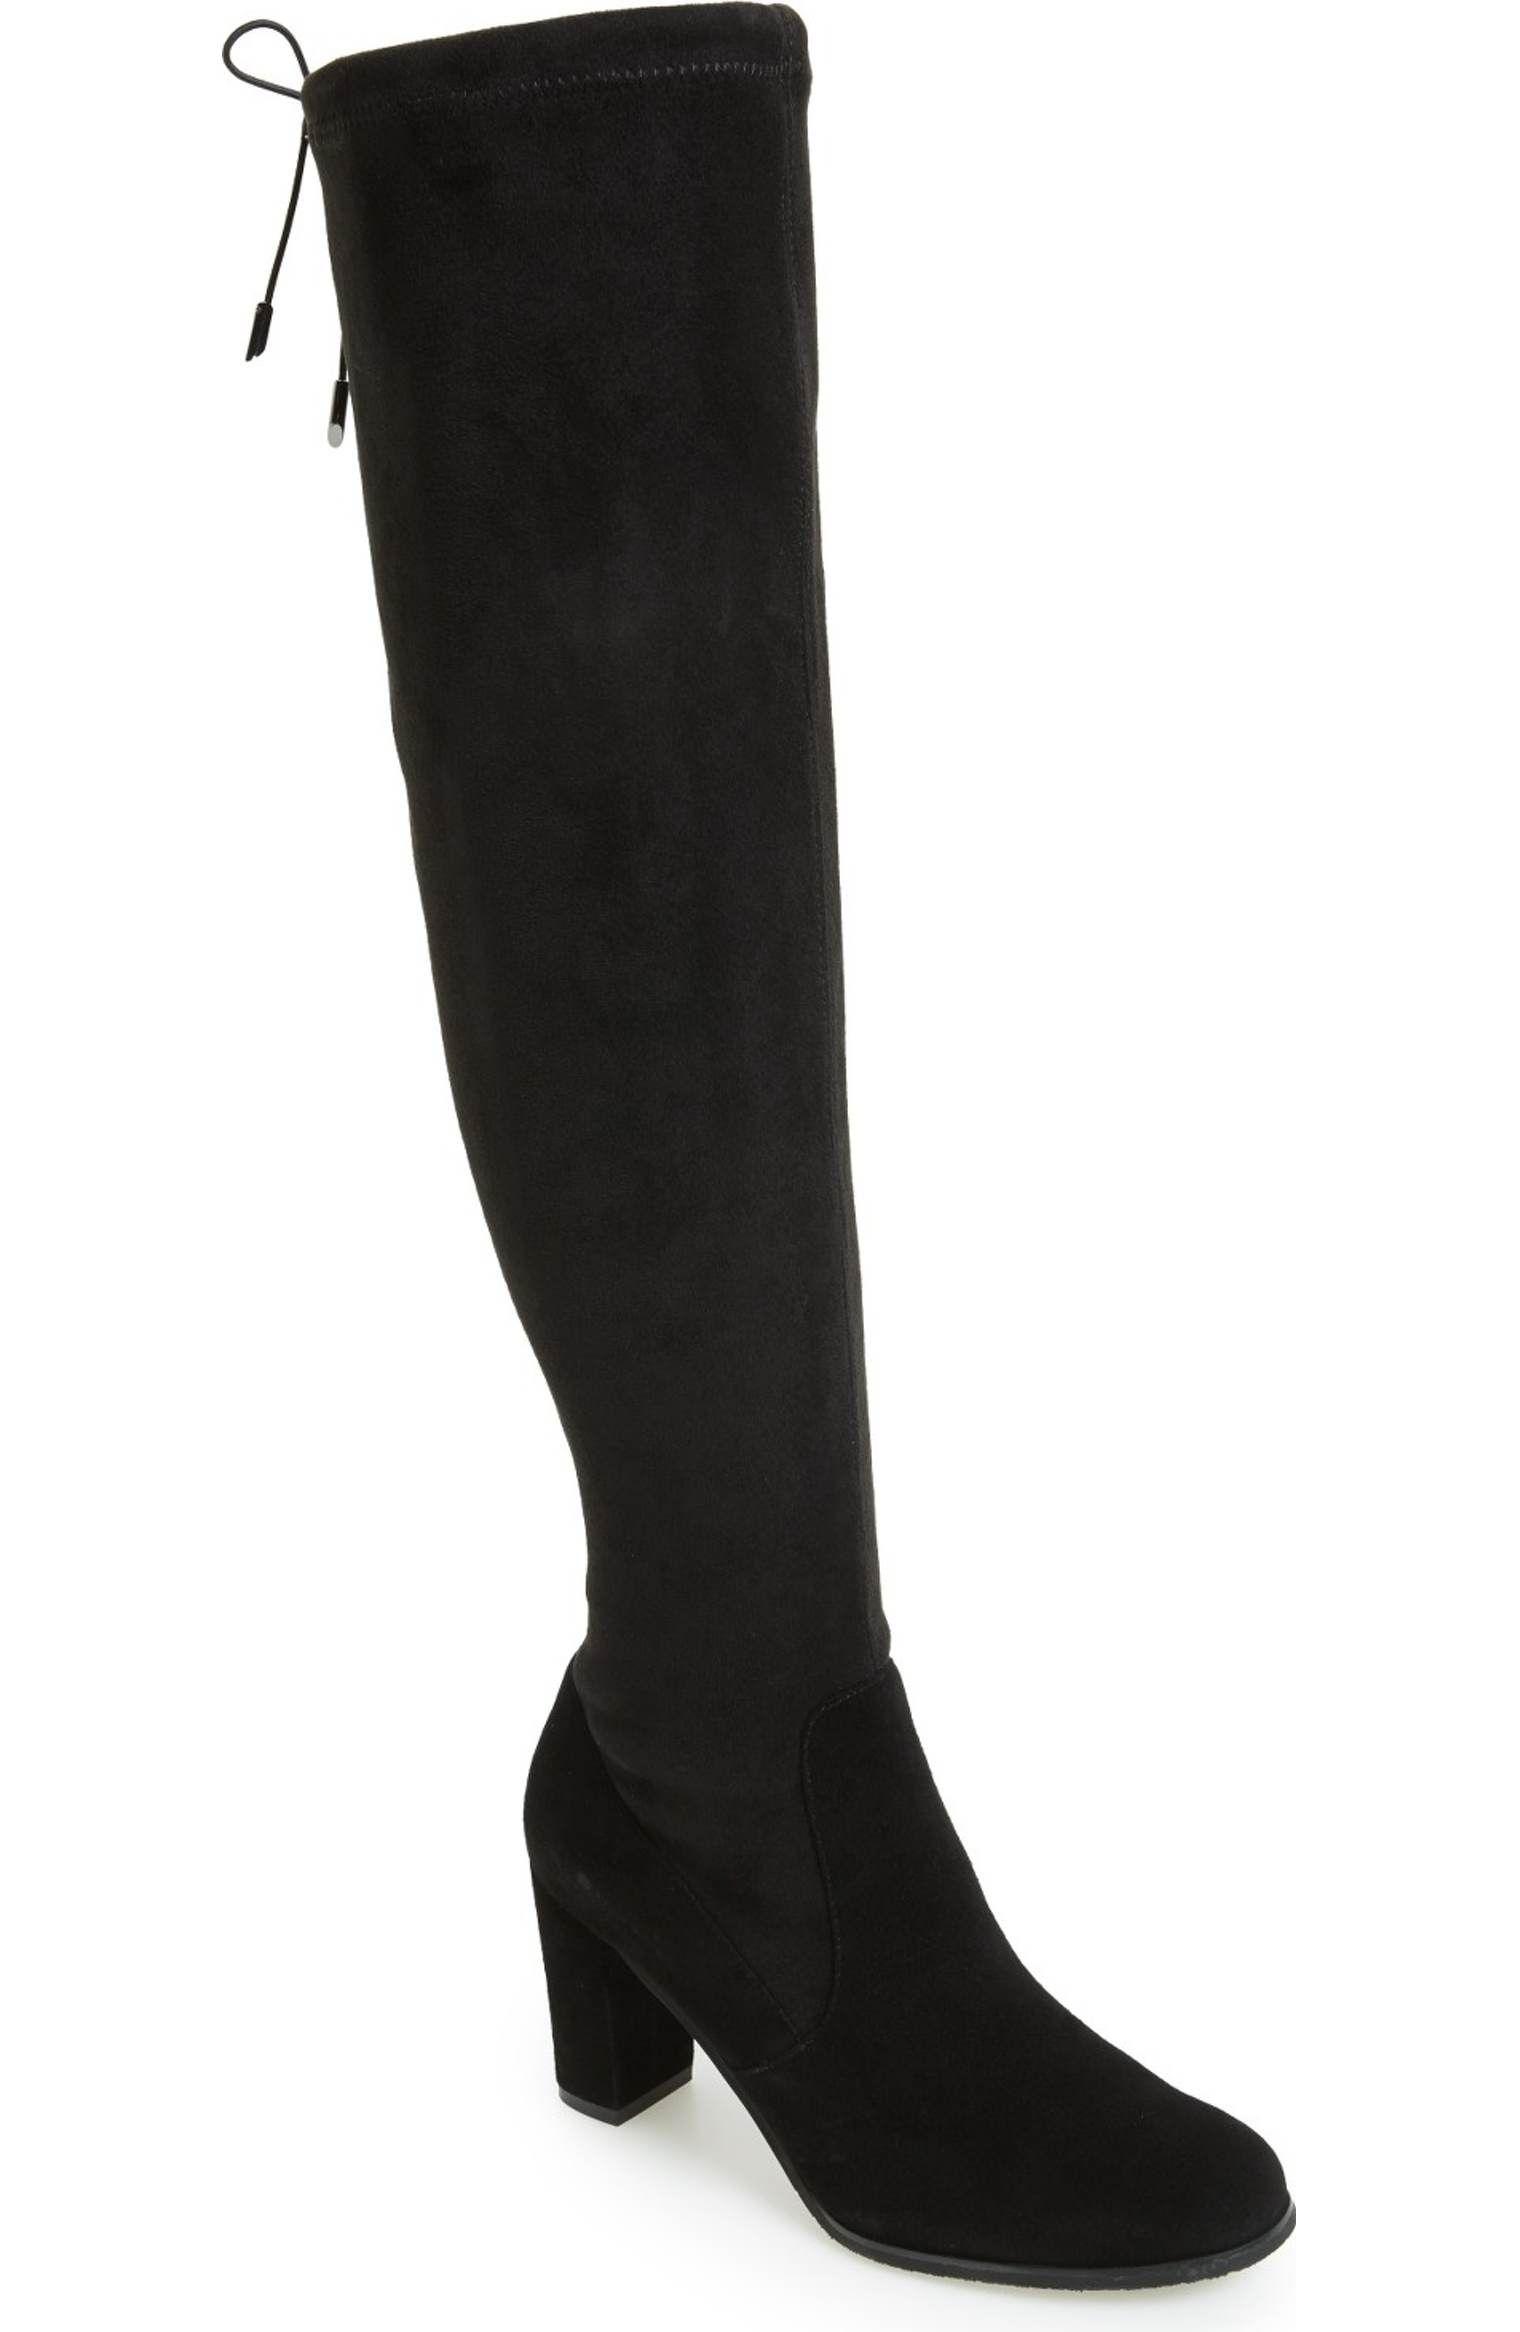 e06da7e9ac8 Main Image - Blondo Kali Waterproof Over the Knee Boot (Women ...